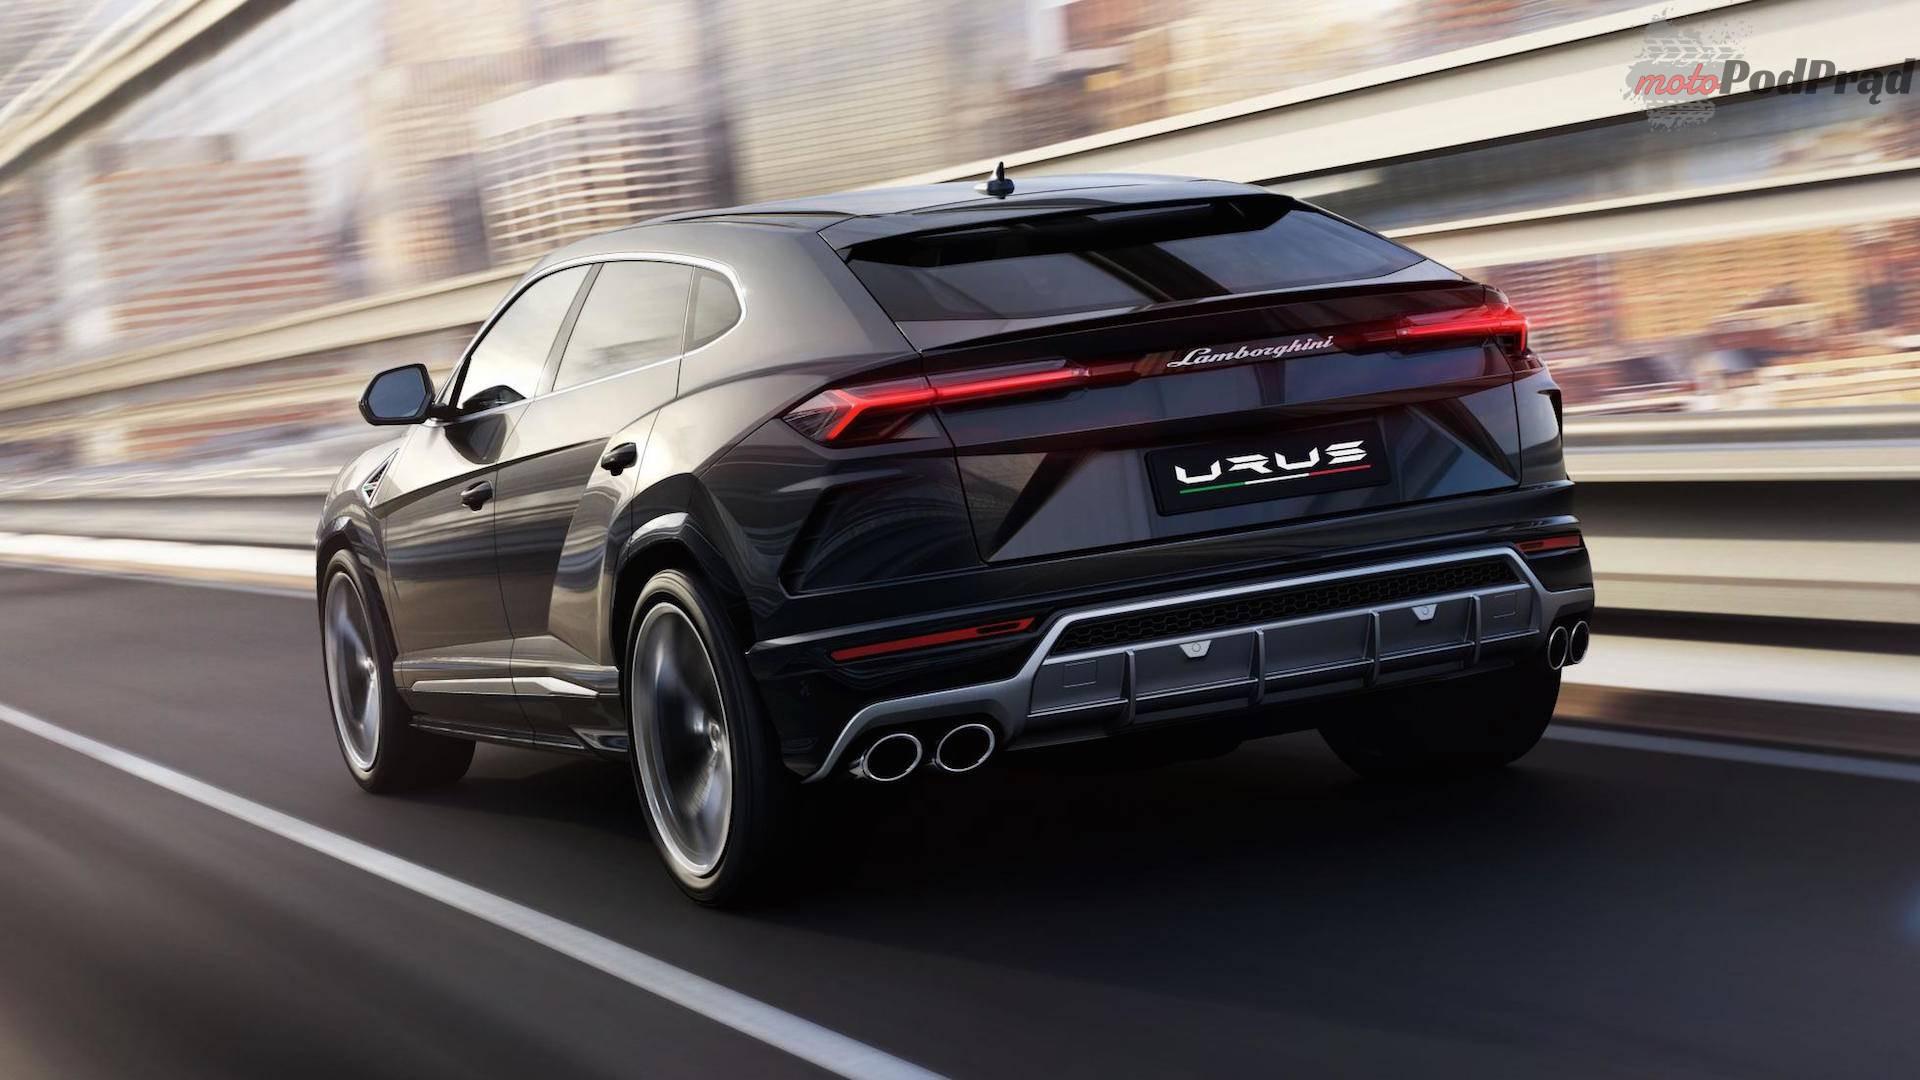 2019 lamborghini urus 2 Lamborghini Urus: nowa definicja SUV a